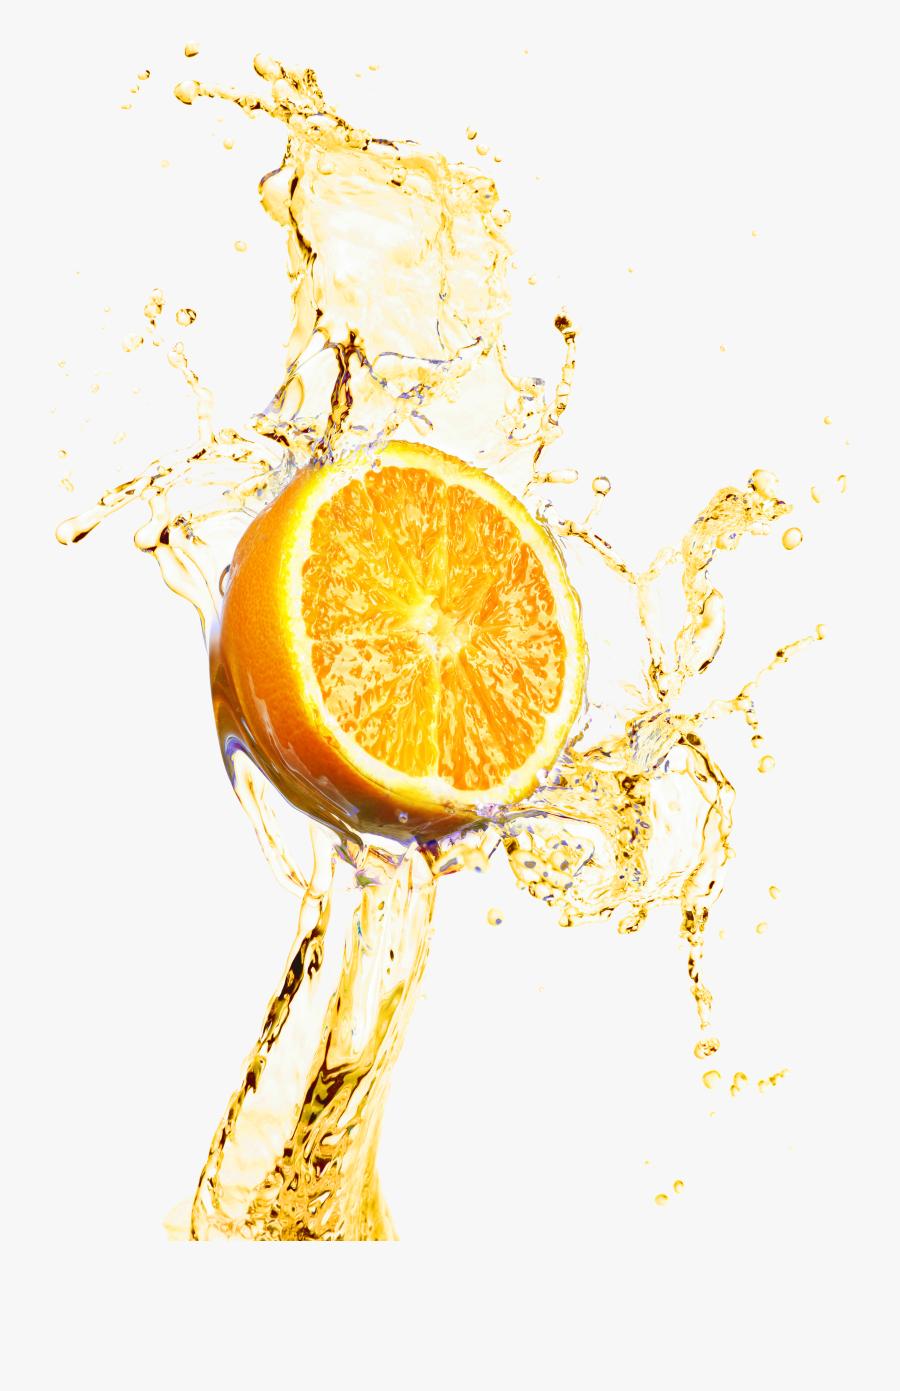 Material Lemonade Decoration Juice Splash Design Orange - Lemonade Splash Png, Transparent Clipart